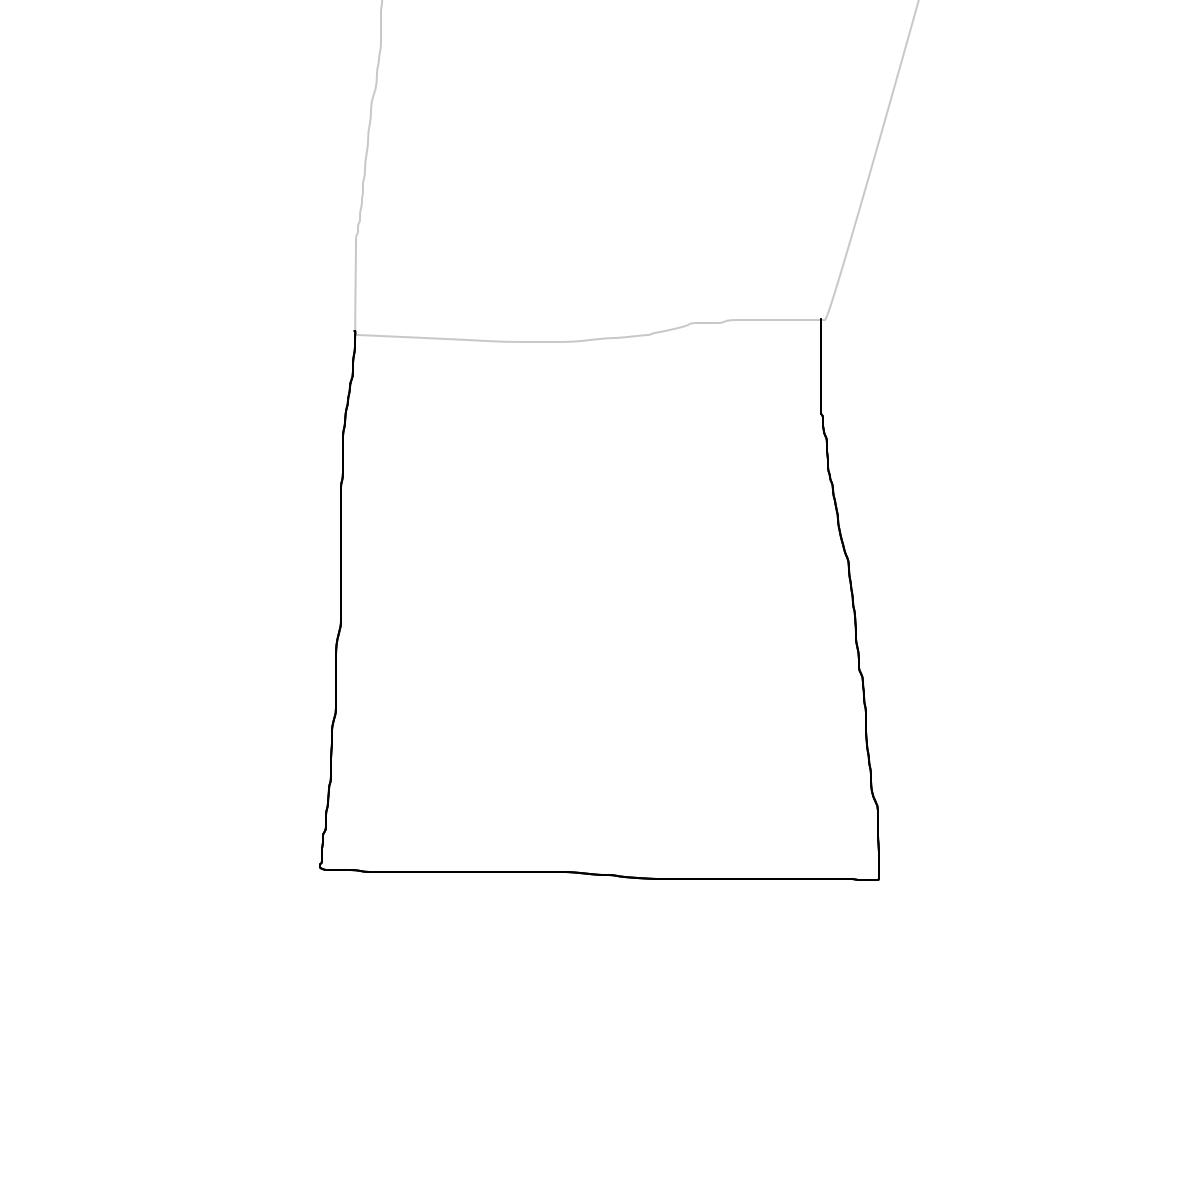 BAAAM drawing#18817 lat:55.7507286071777340lng: 37.6162948608398440